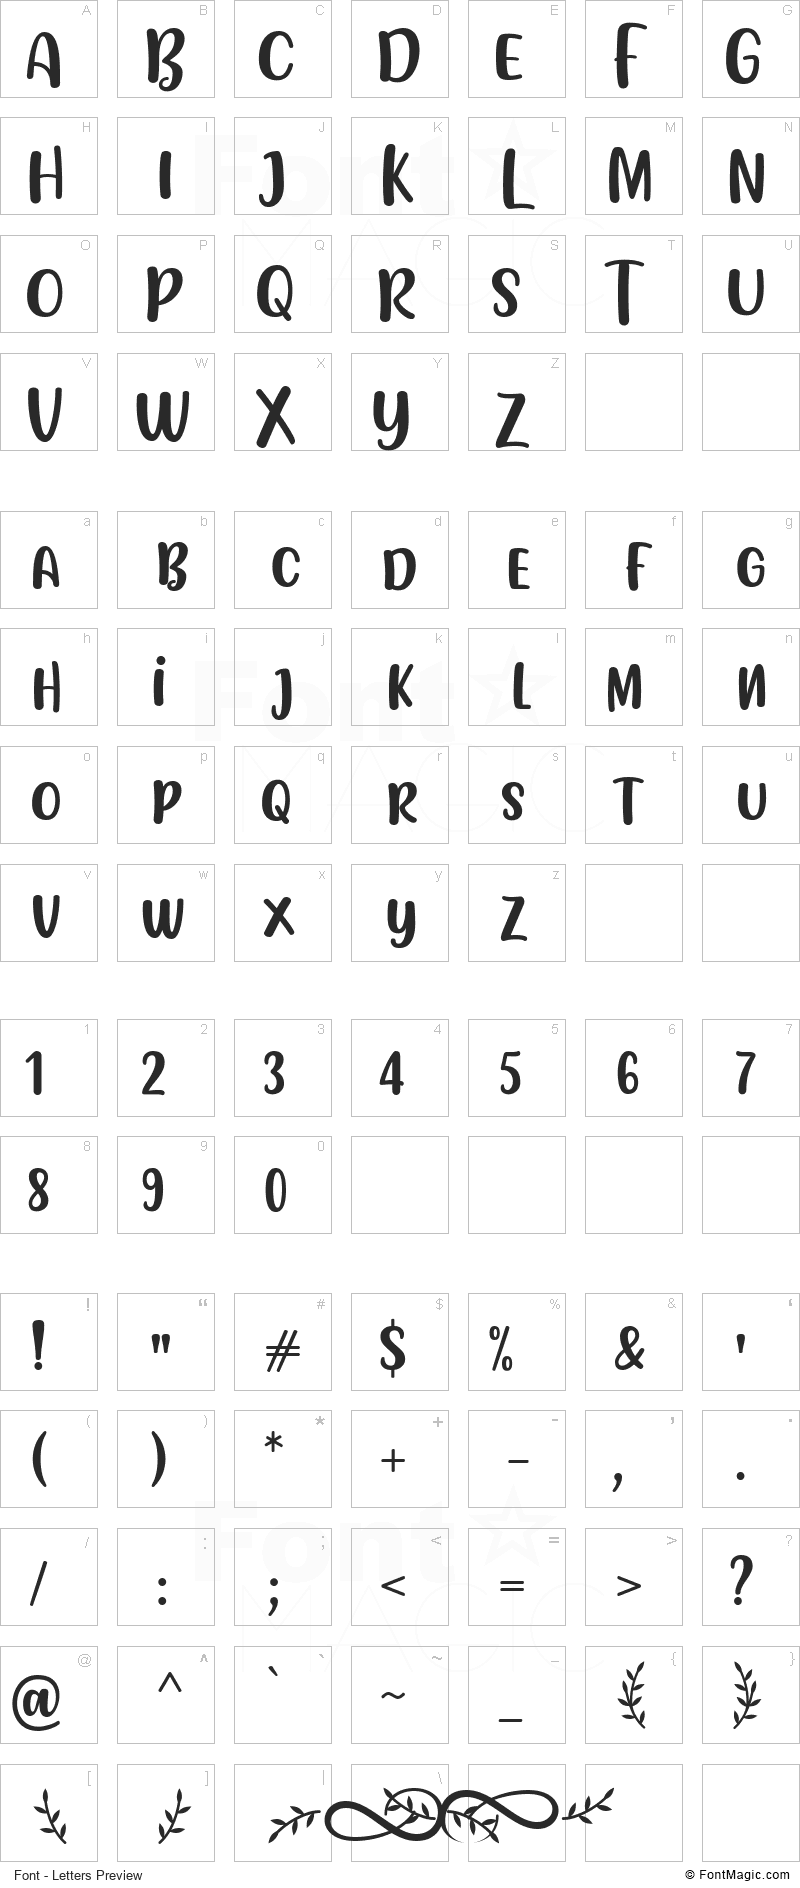 Flotta Font - All Latters Preview Chart